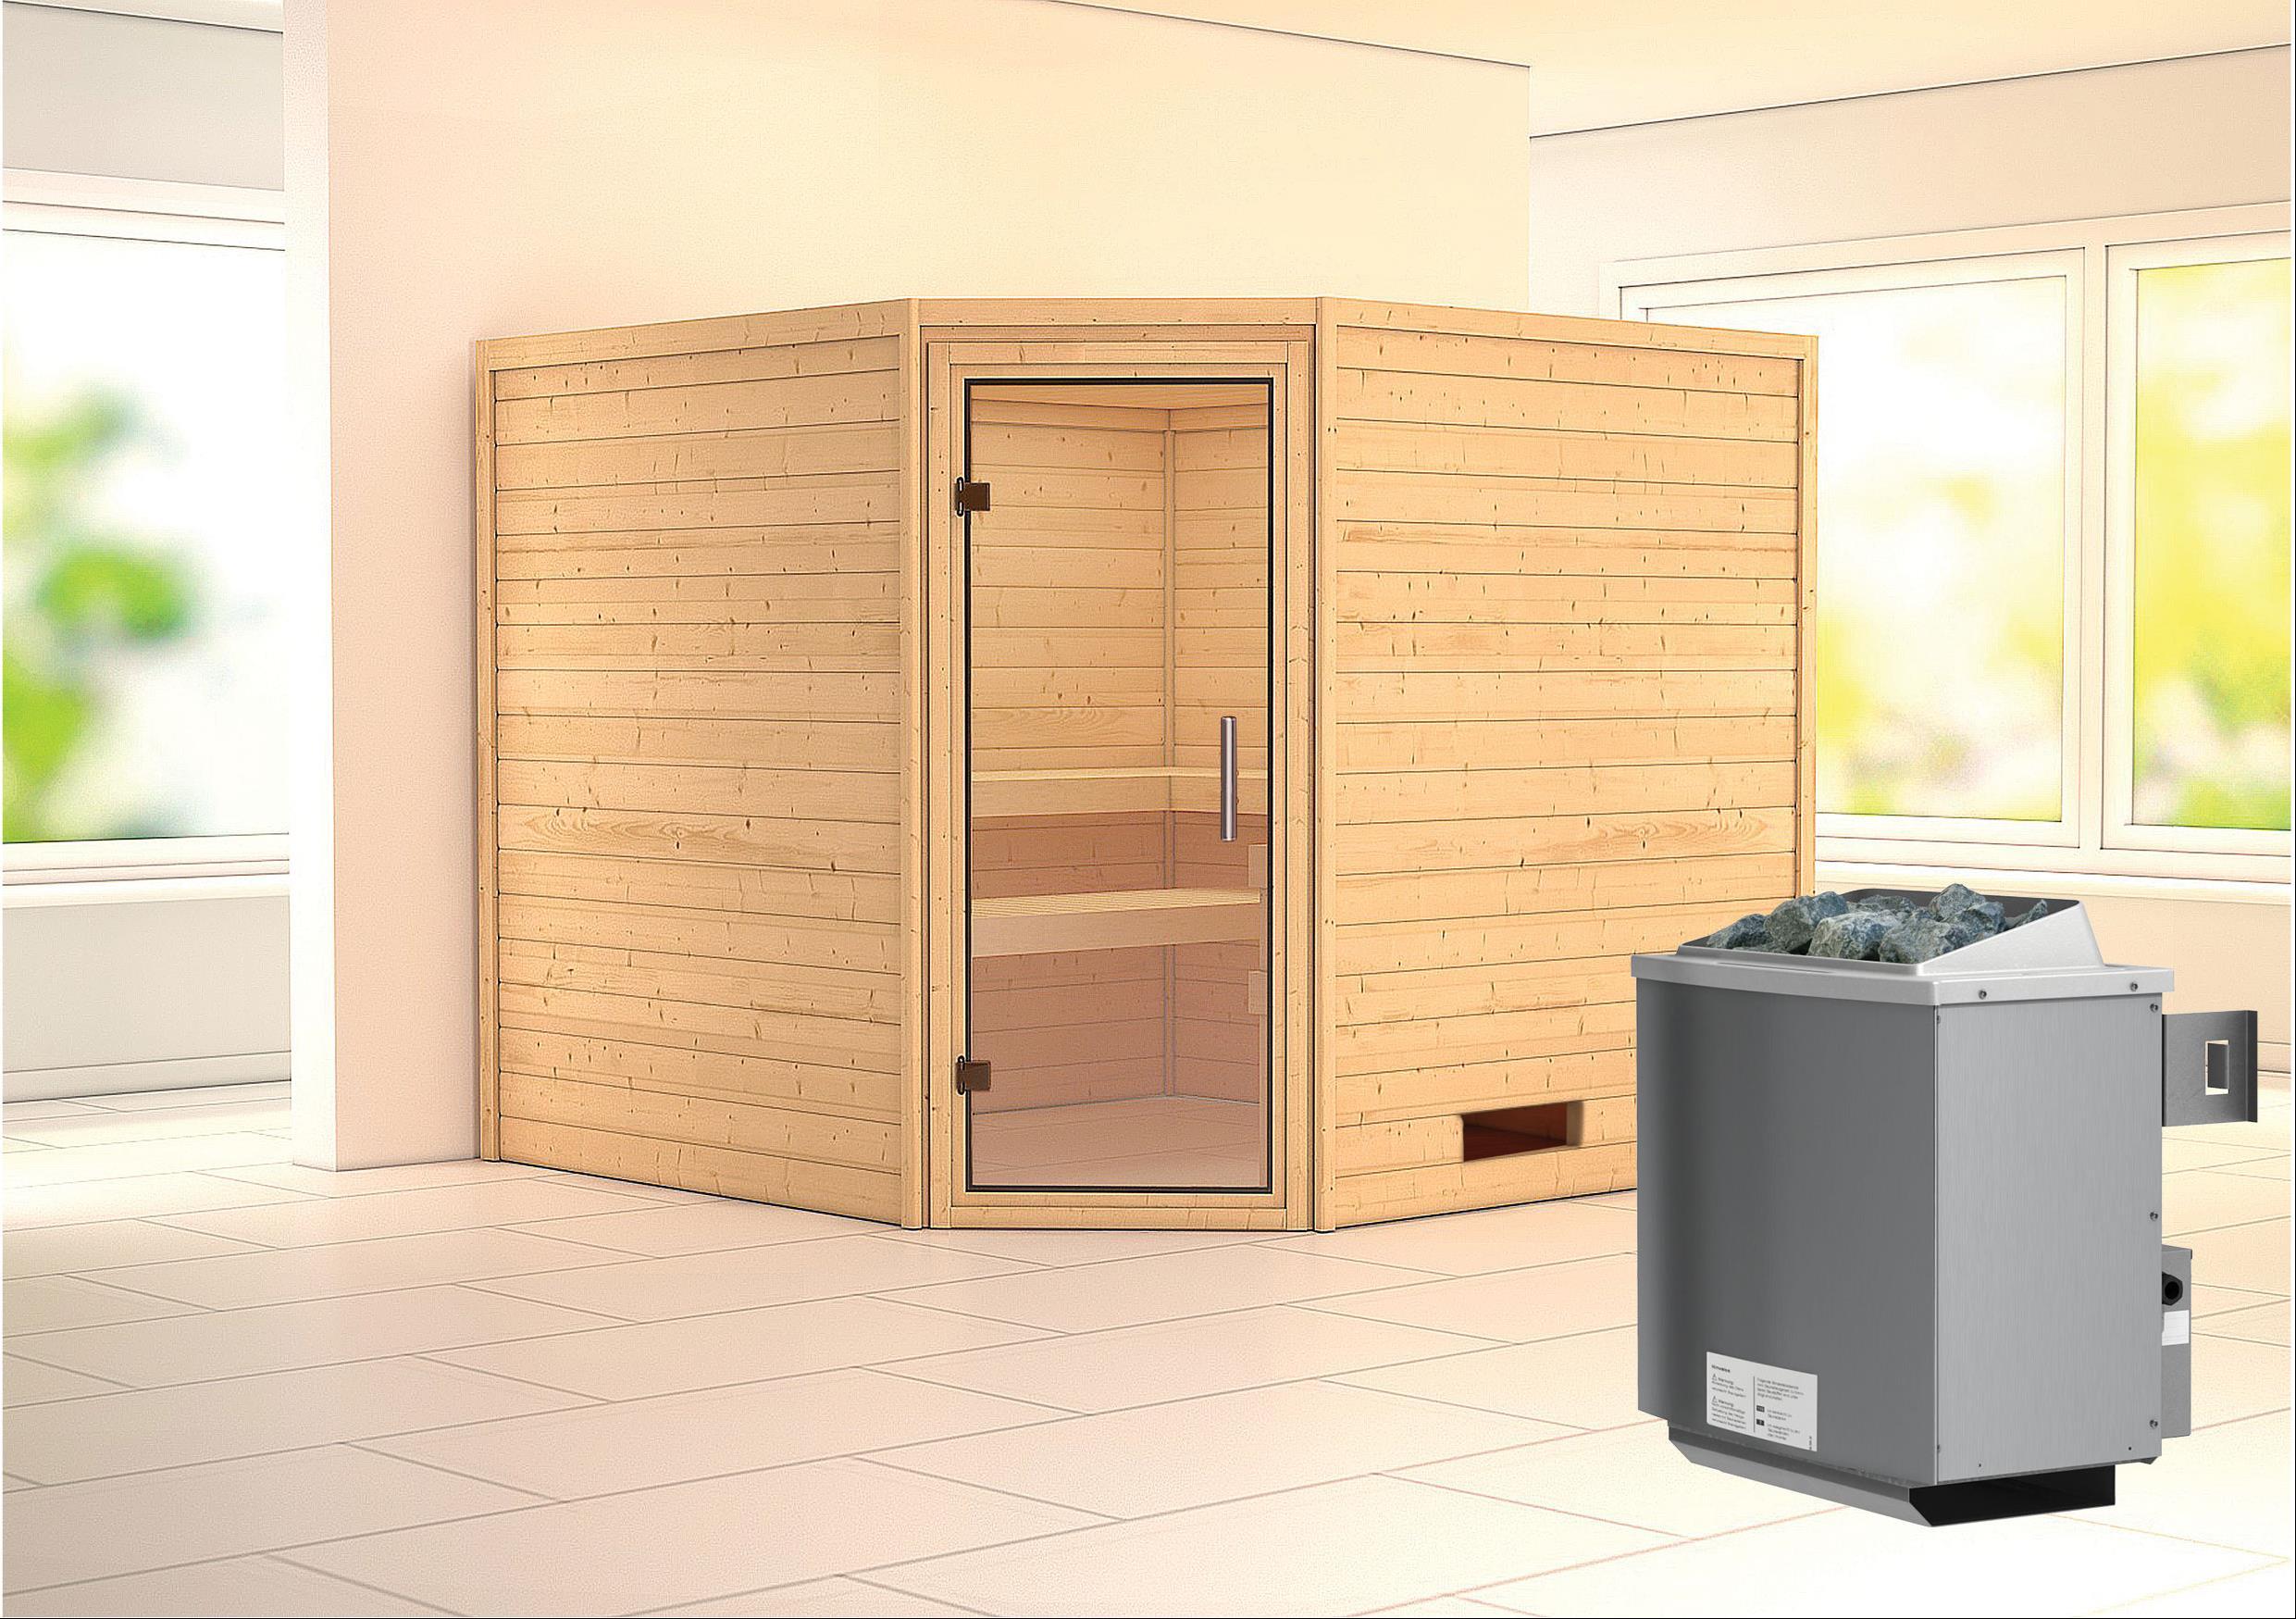 Woodfeeling Sauna Leona 38mm Ofen 9kW intern Tür Klarglas Bild 1